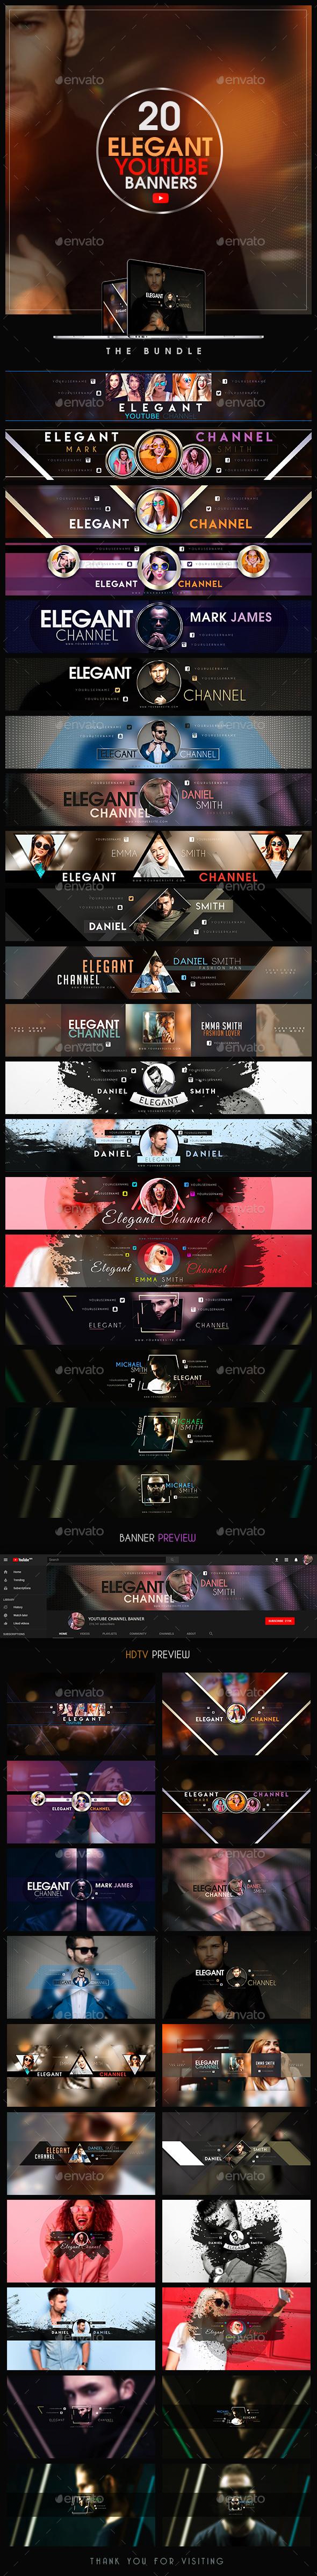 YouTube Bundle - 20 Elegant Banners - YouTube Social Media